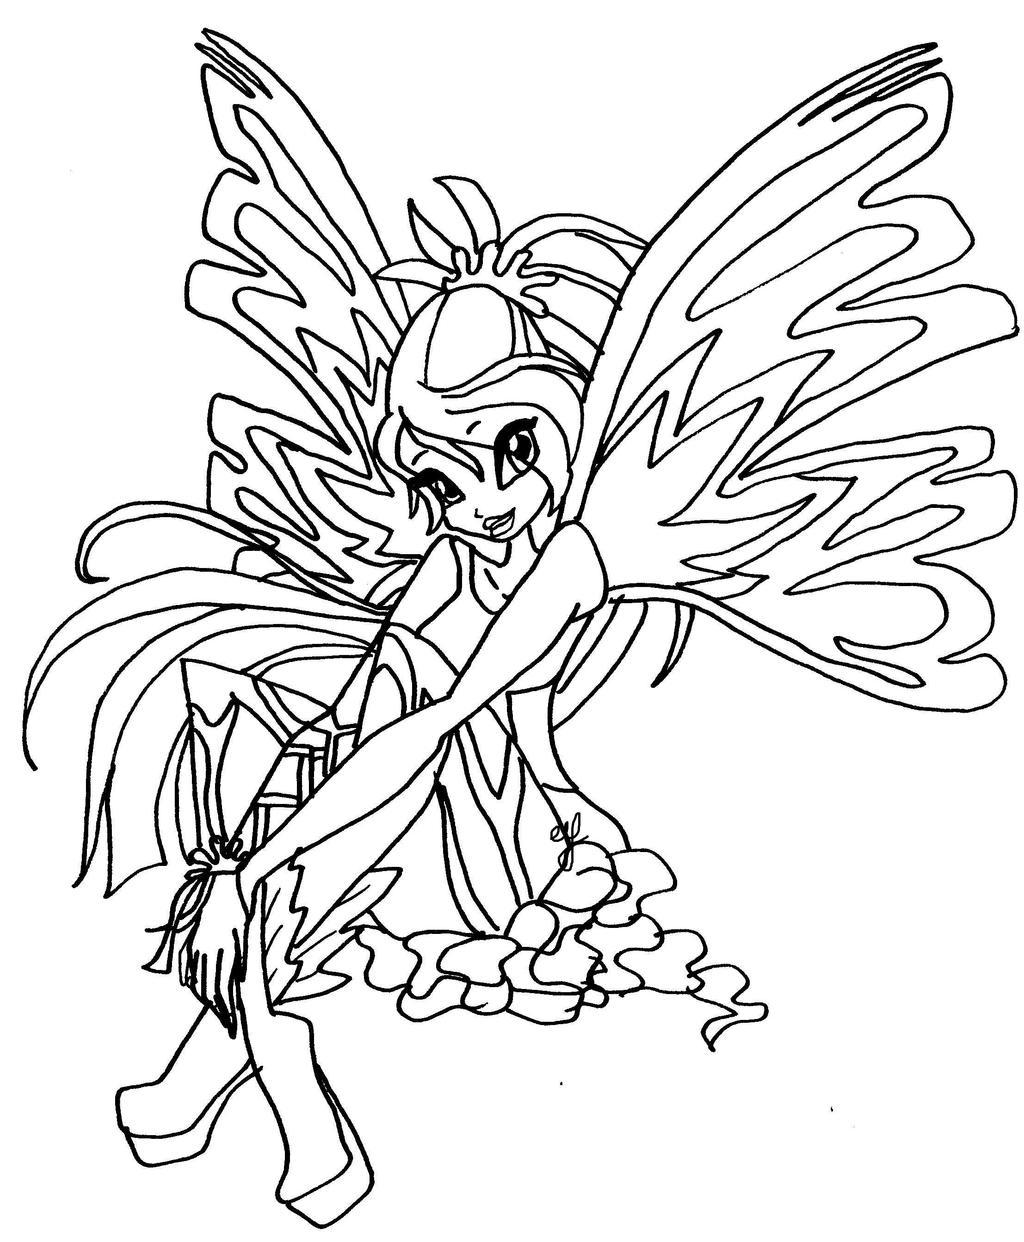 Bloom sirenix by elfkena on deviantart - Coloriage des winx ...